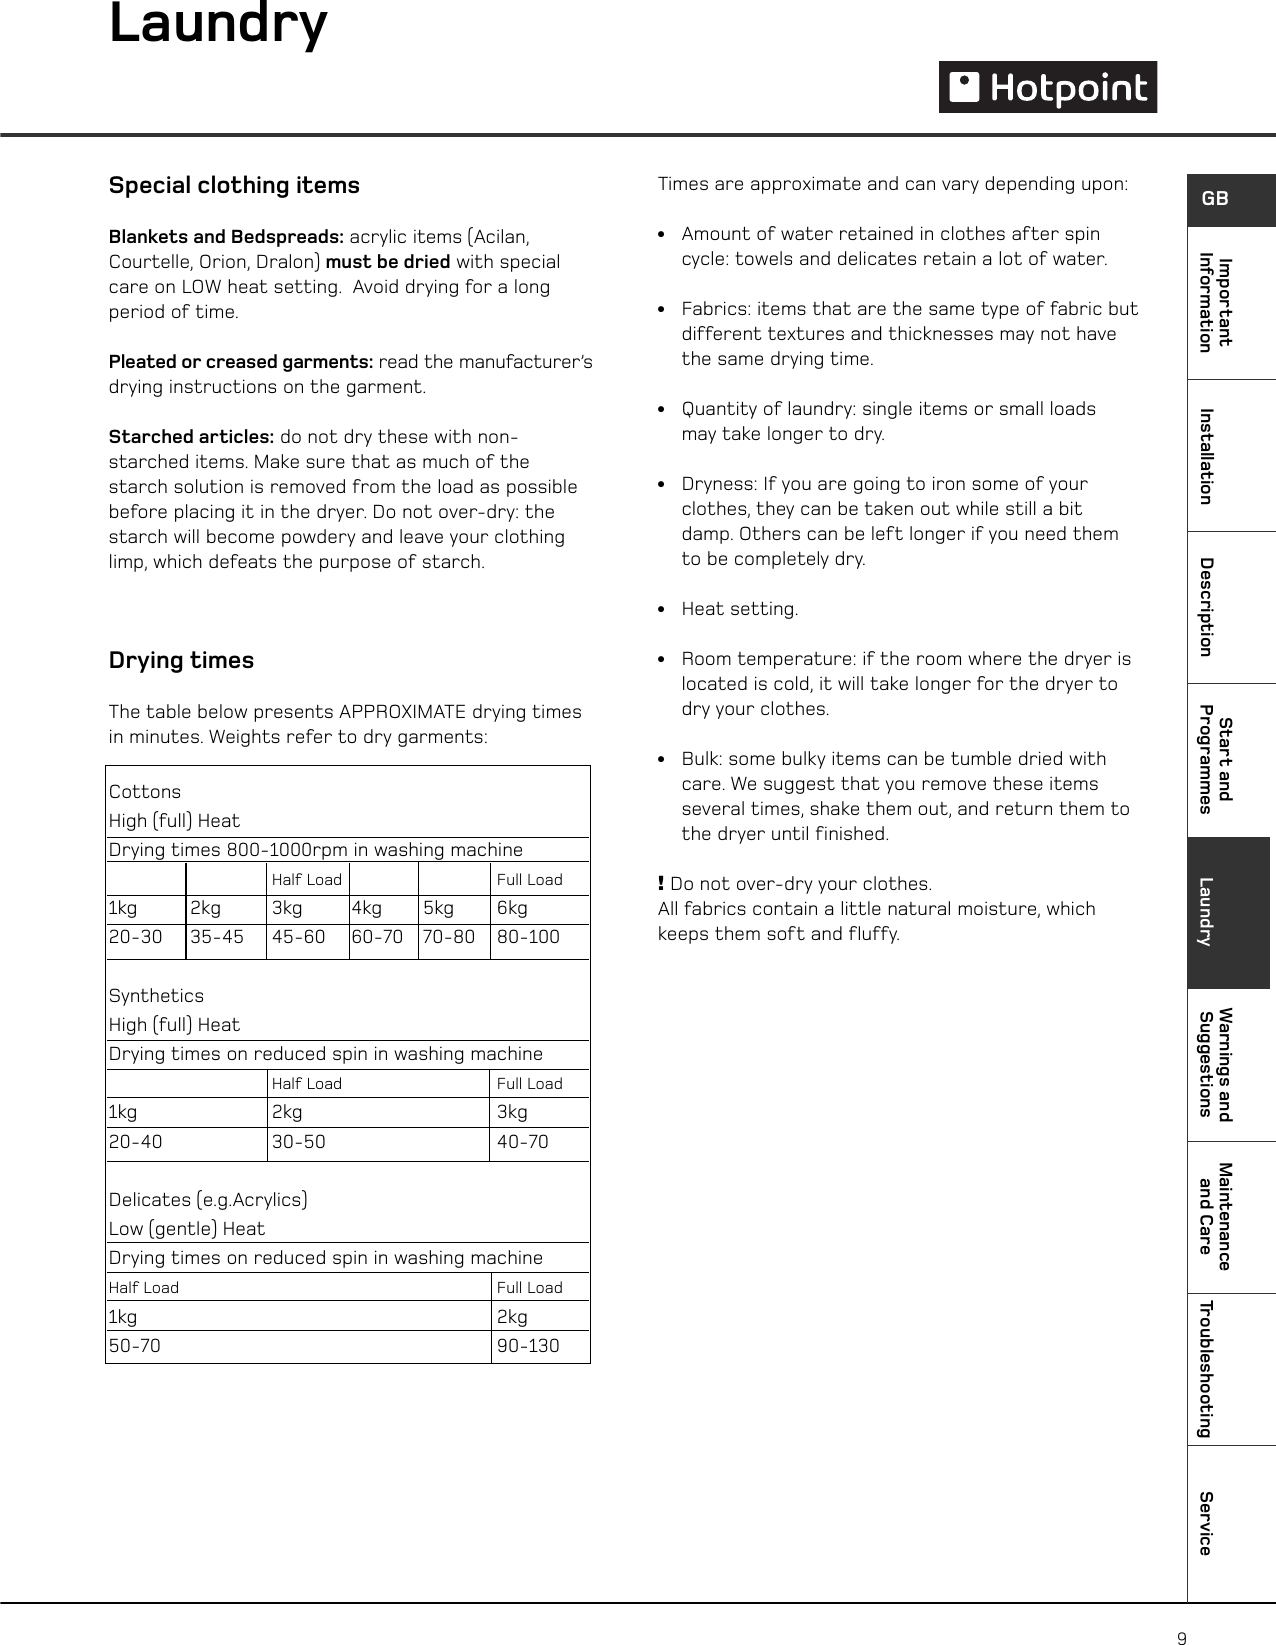 Hotpoint Vtd60 Users Manual